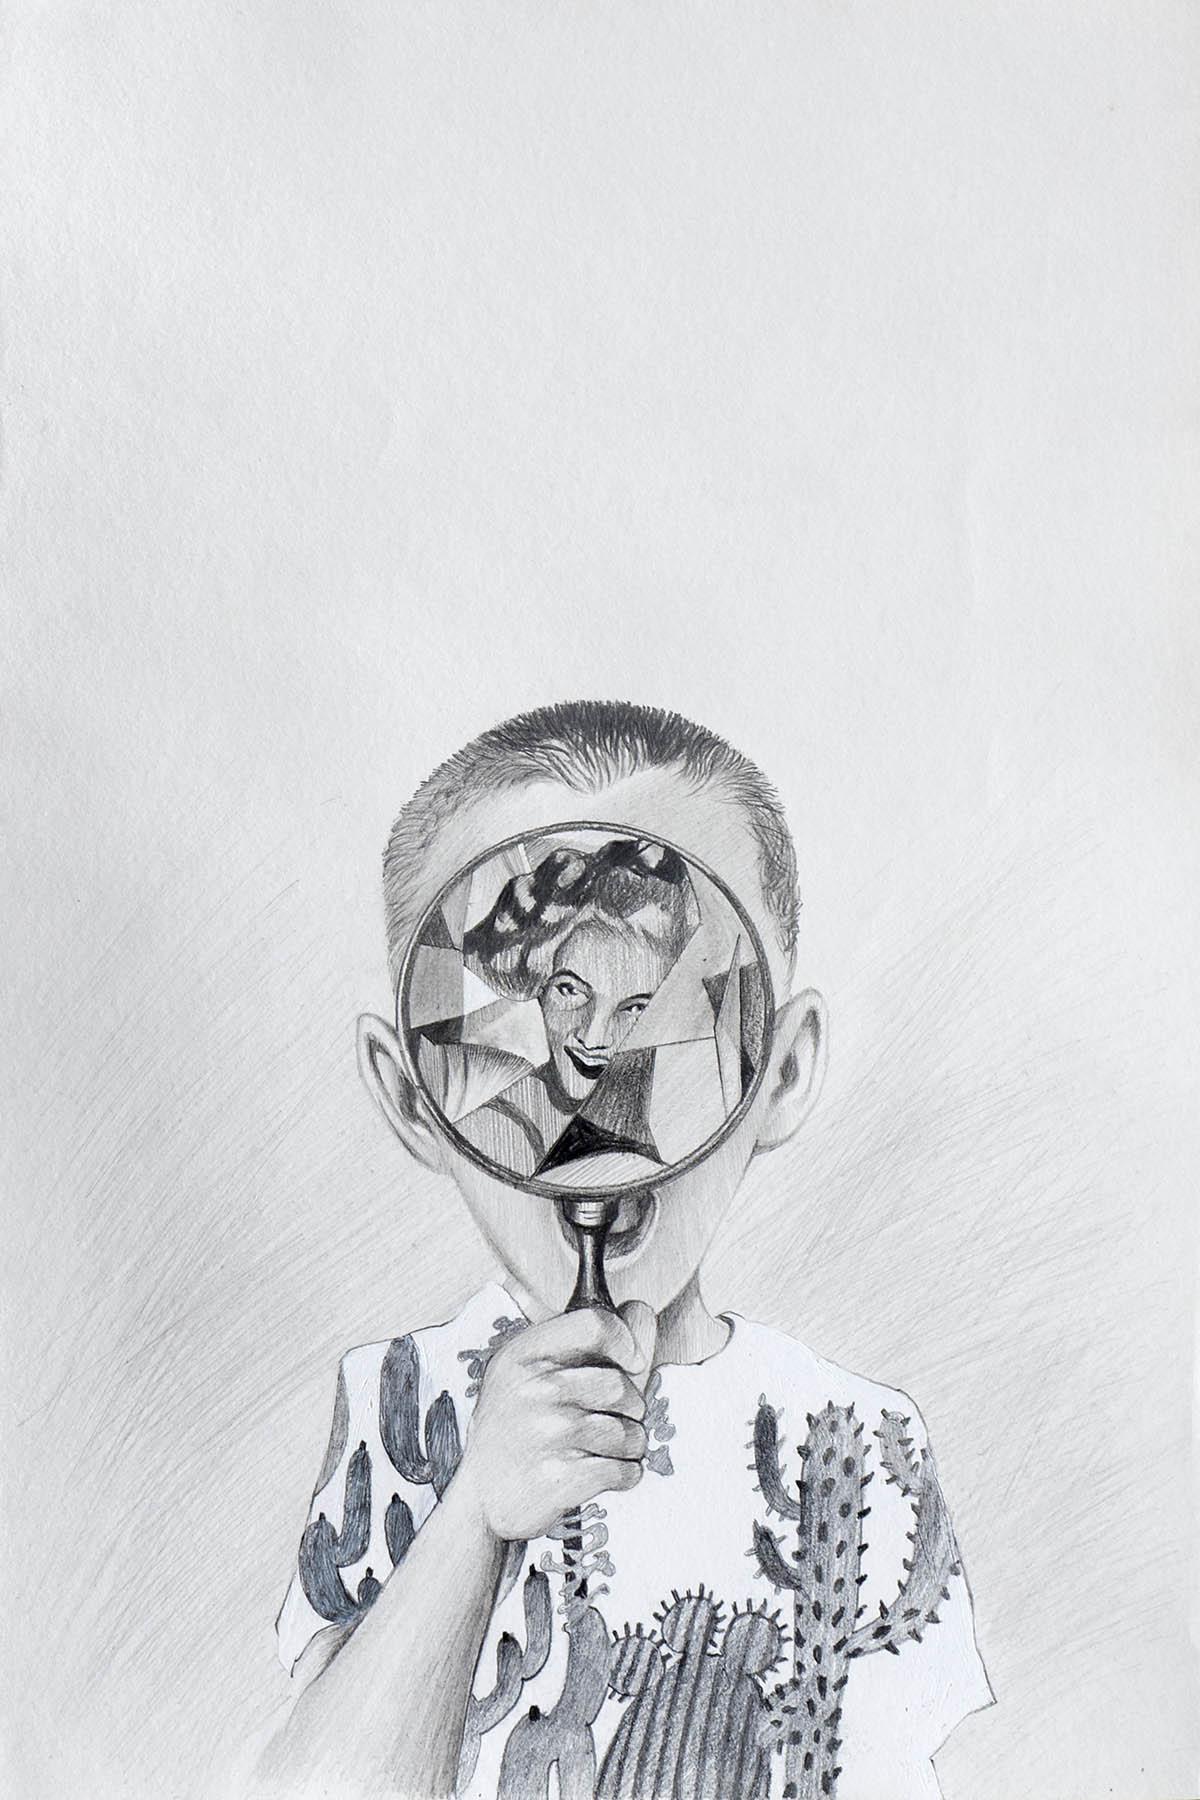 charcoal on paper drawing by kk raghava